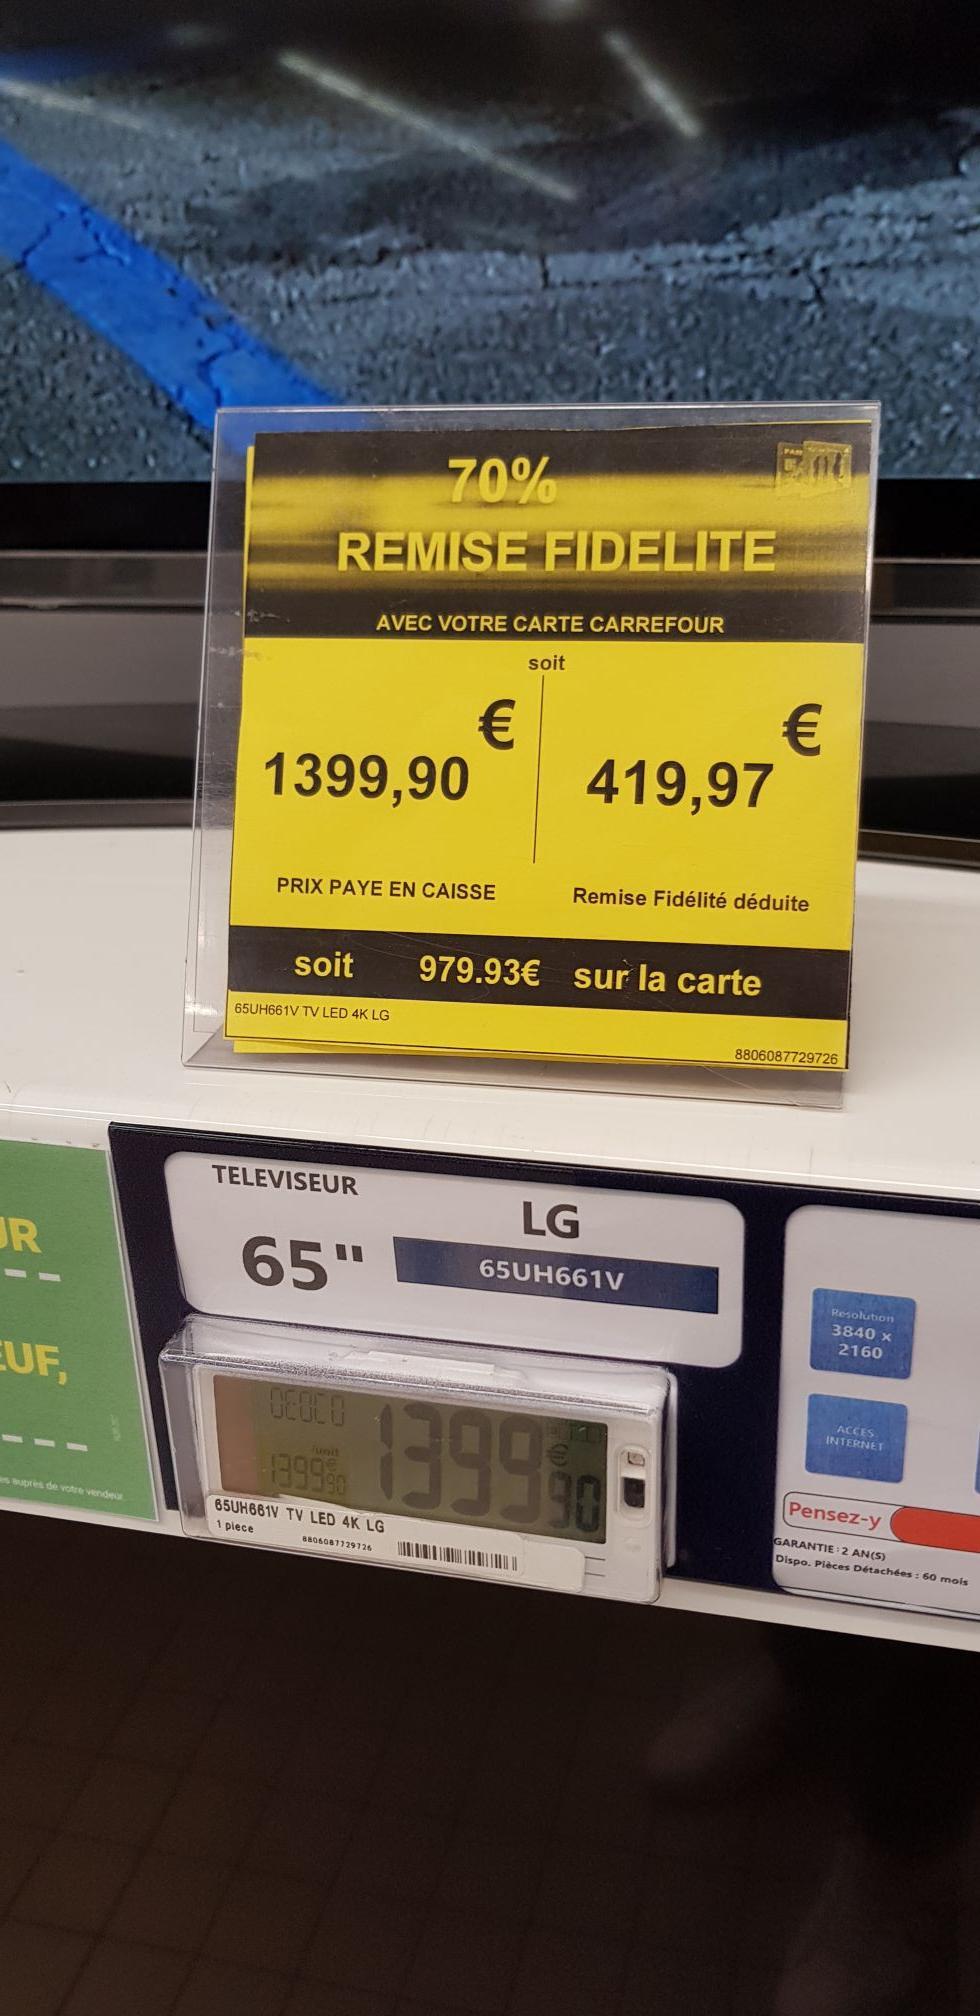 "TV 65"" LG 65UH661V - LED, 4K UHD, Smart TV (via 979,73€ sur la carte fidélité) - Claira (66)"